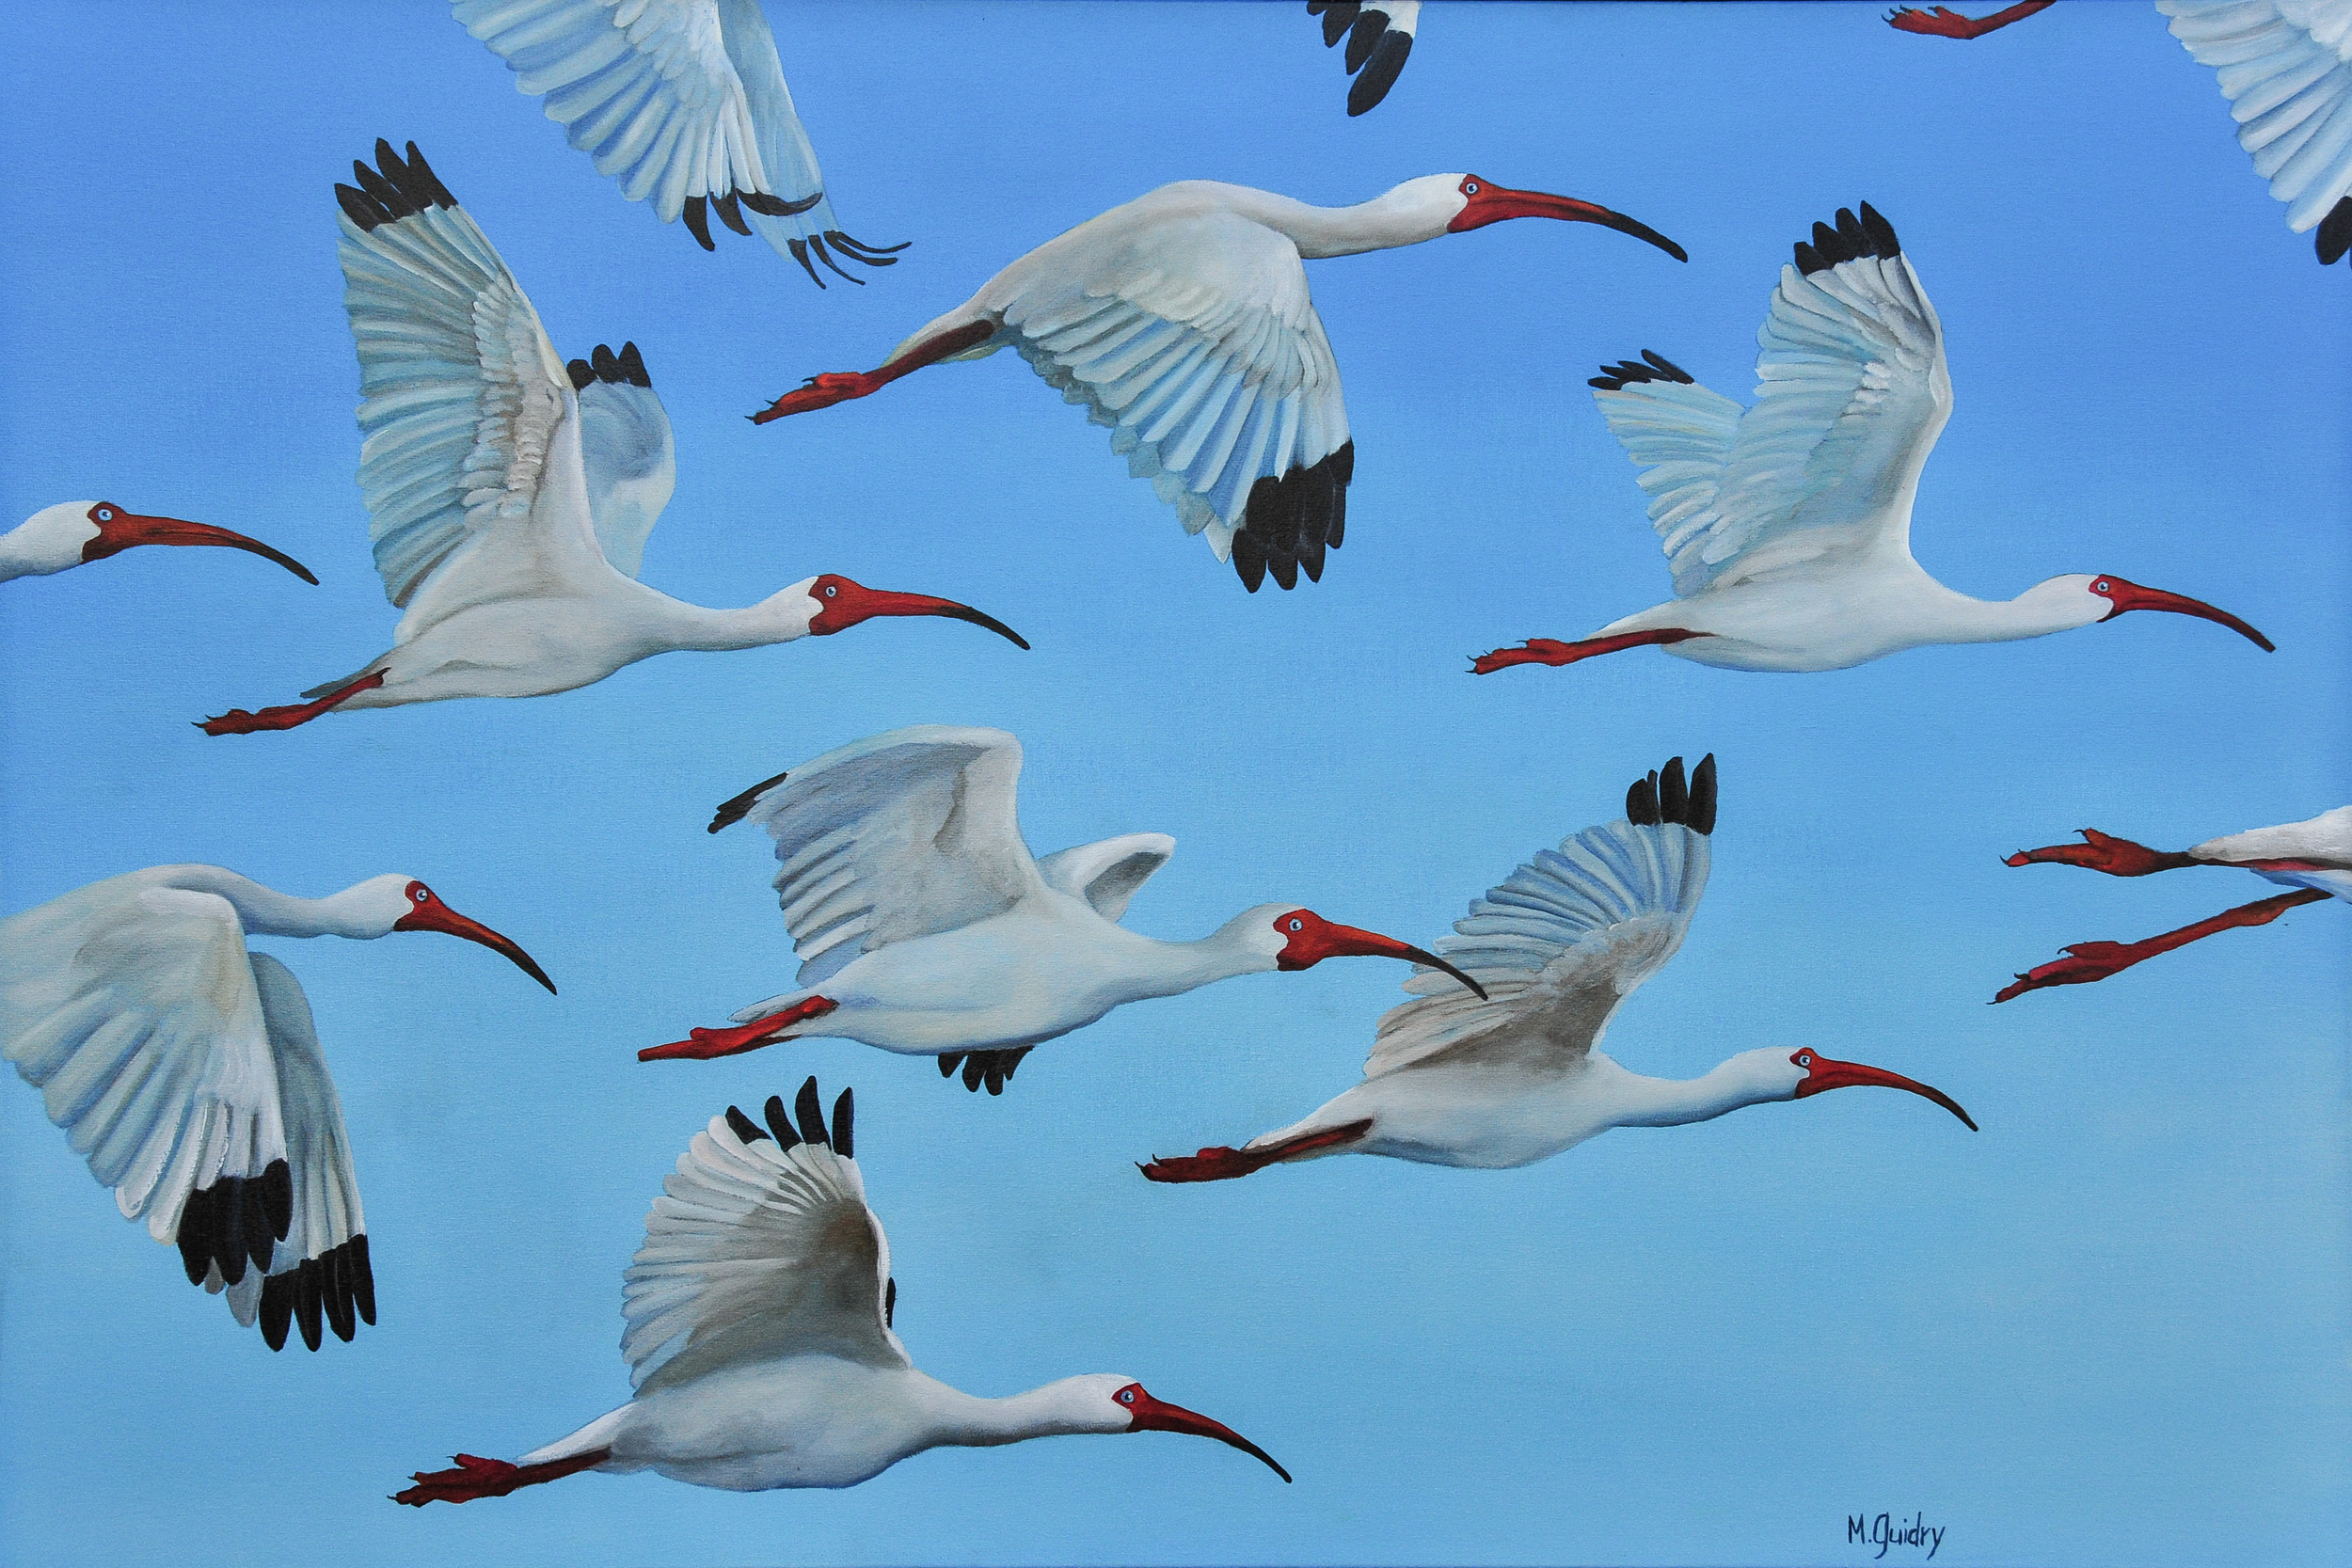 les_becs_croches_white_ibis__louisiana_m.guidry_michael_guidry_oil_painting_marsh_new_orleans_artist.jpg.jpg